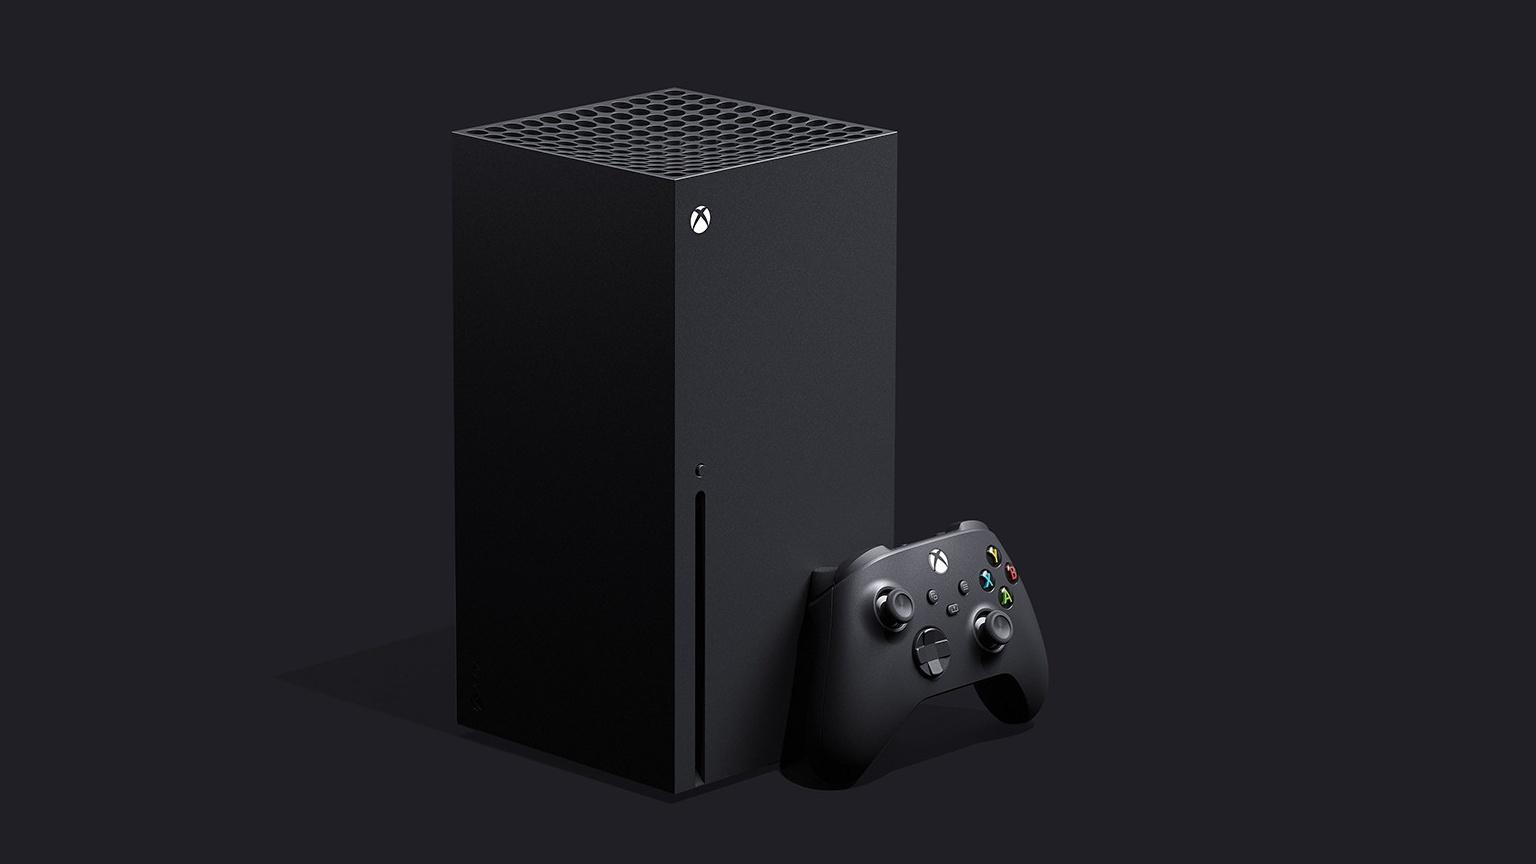 The fat Xbox Series X.